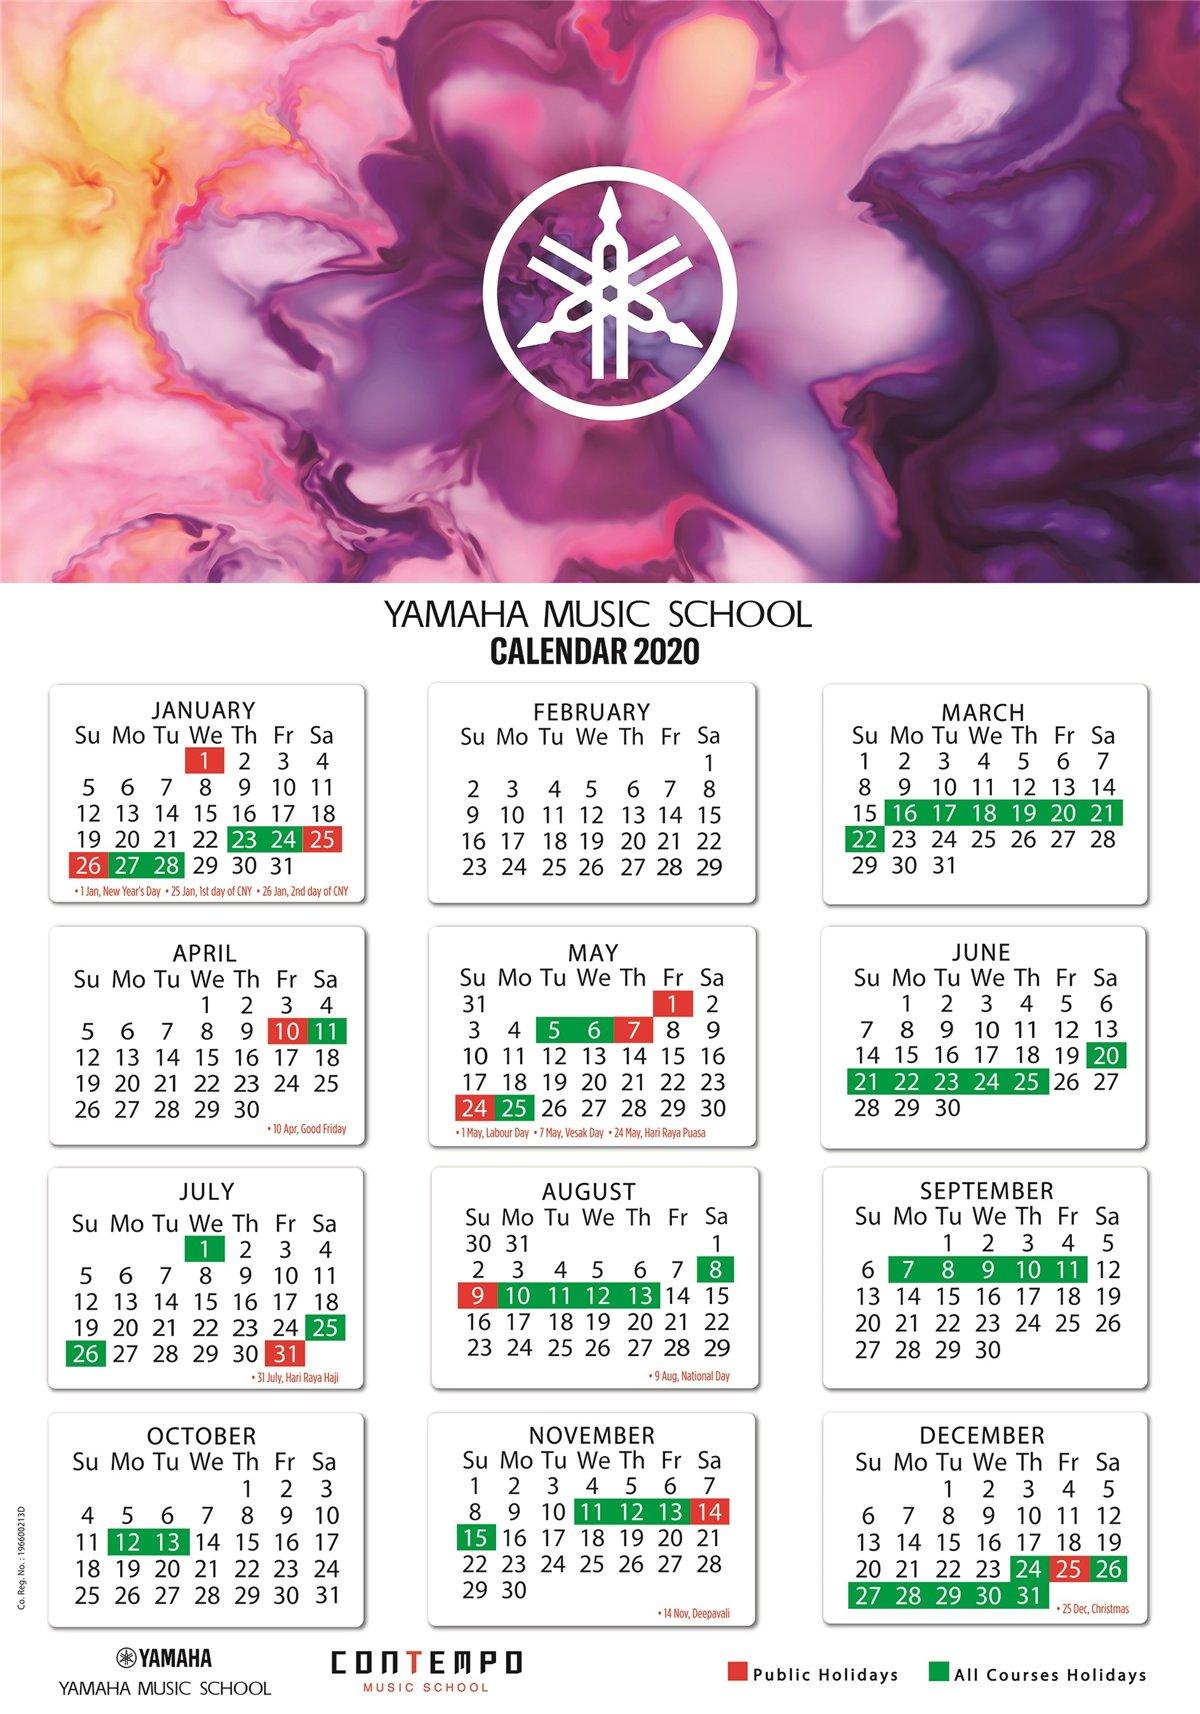 Yamaha Course Calendar 2020  Yamaha  Singapore within Yamaha Calendar 2020 Singapore